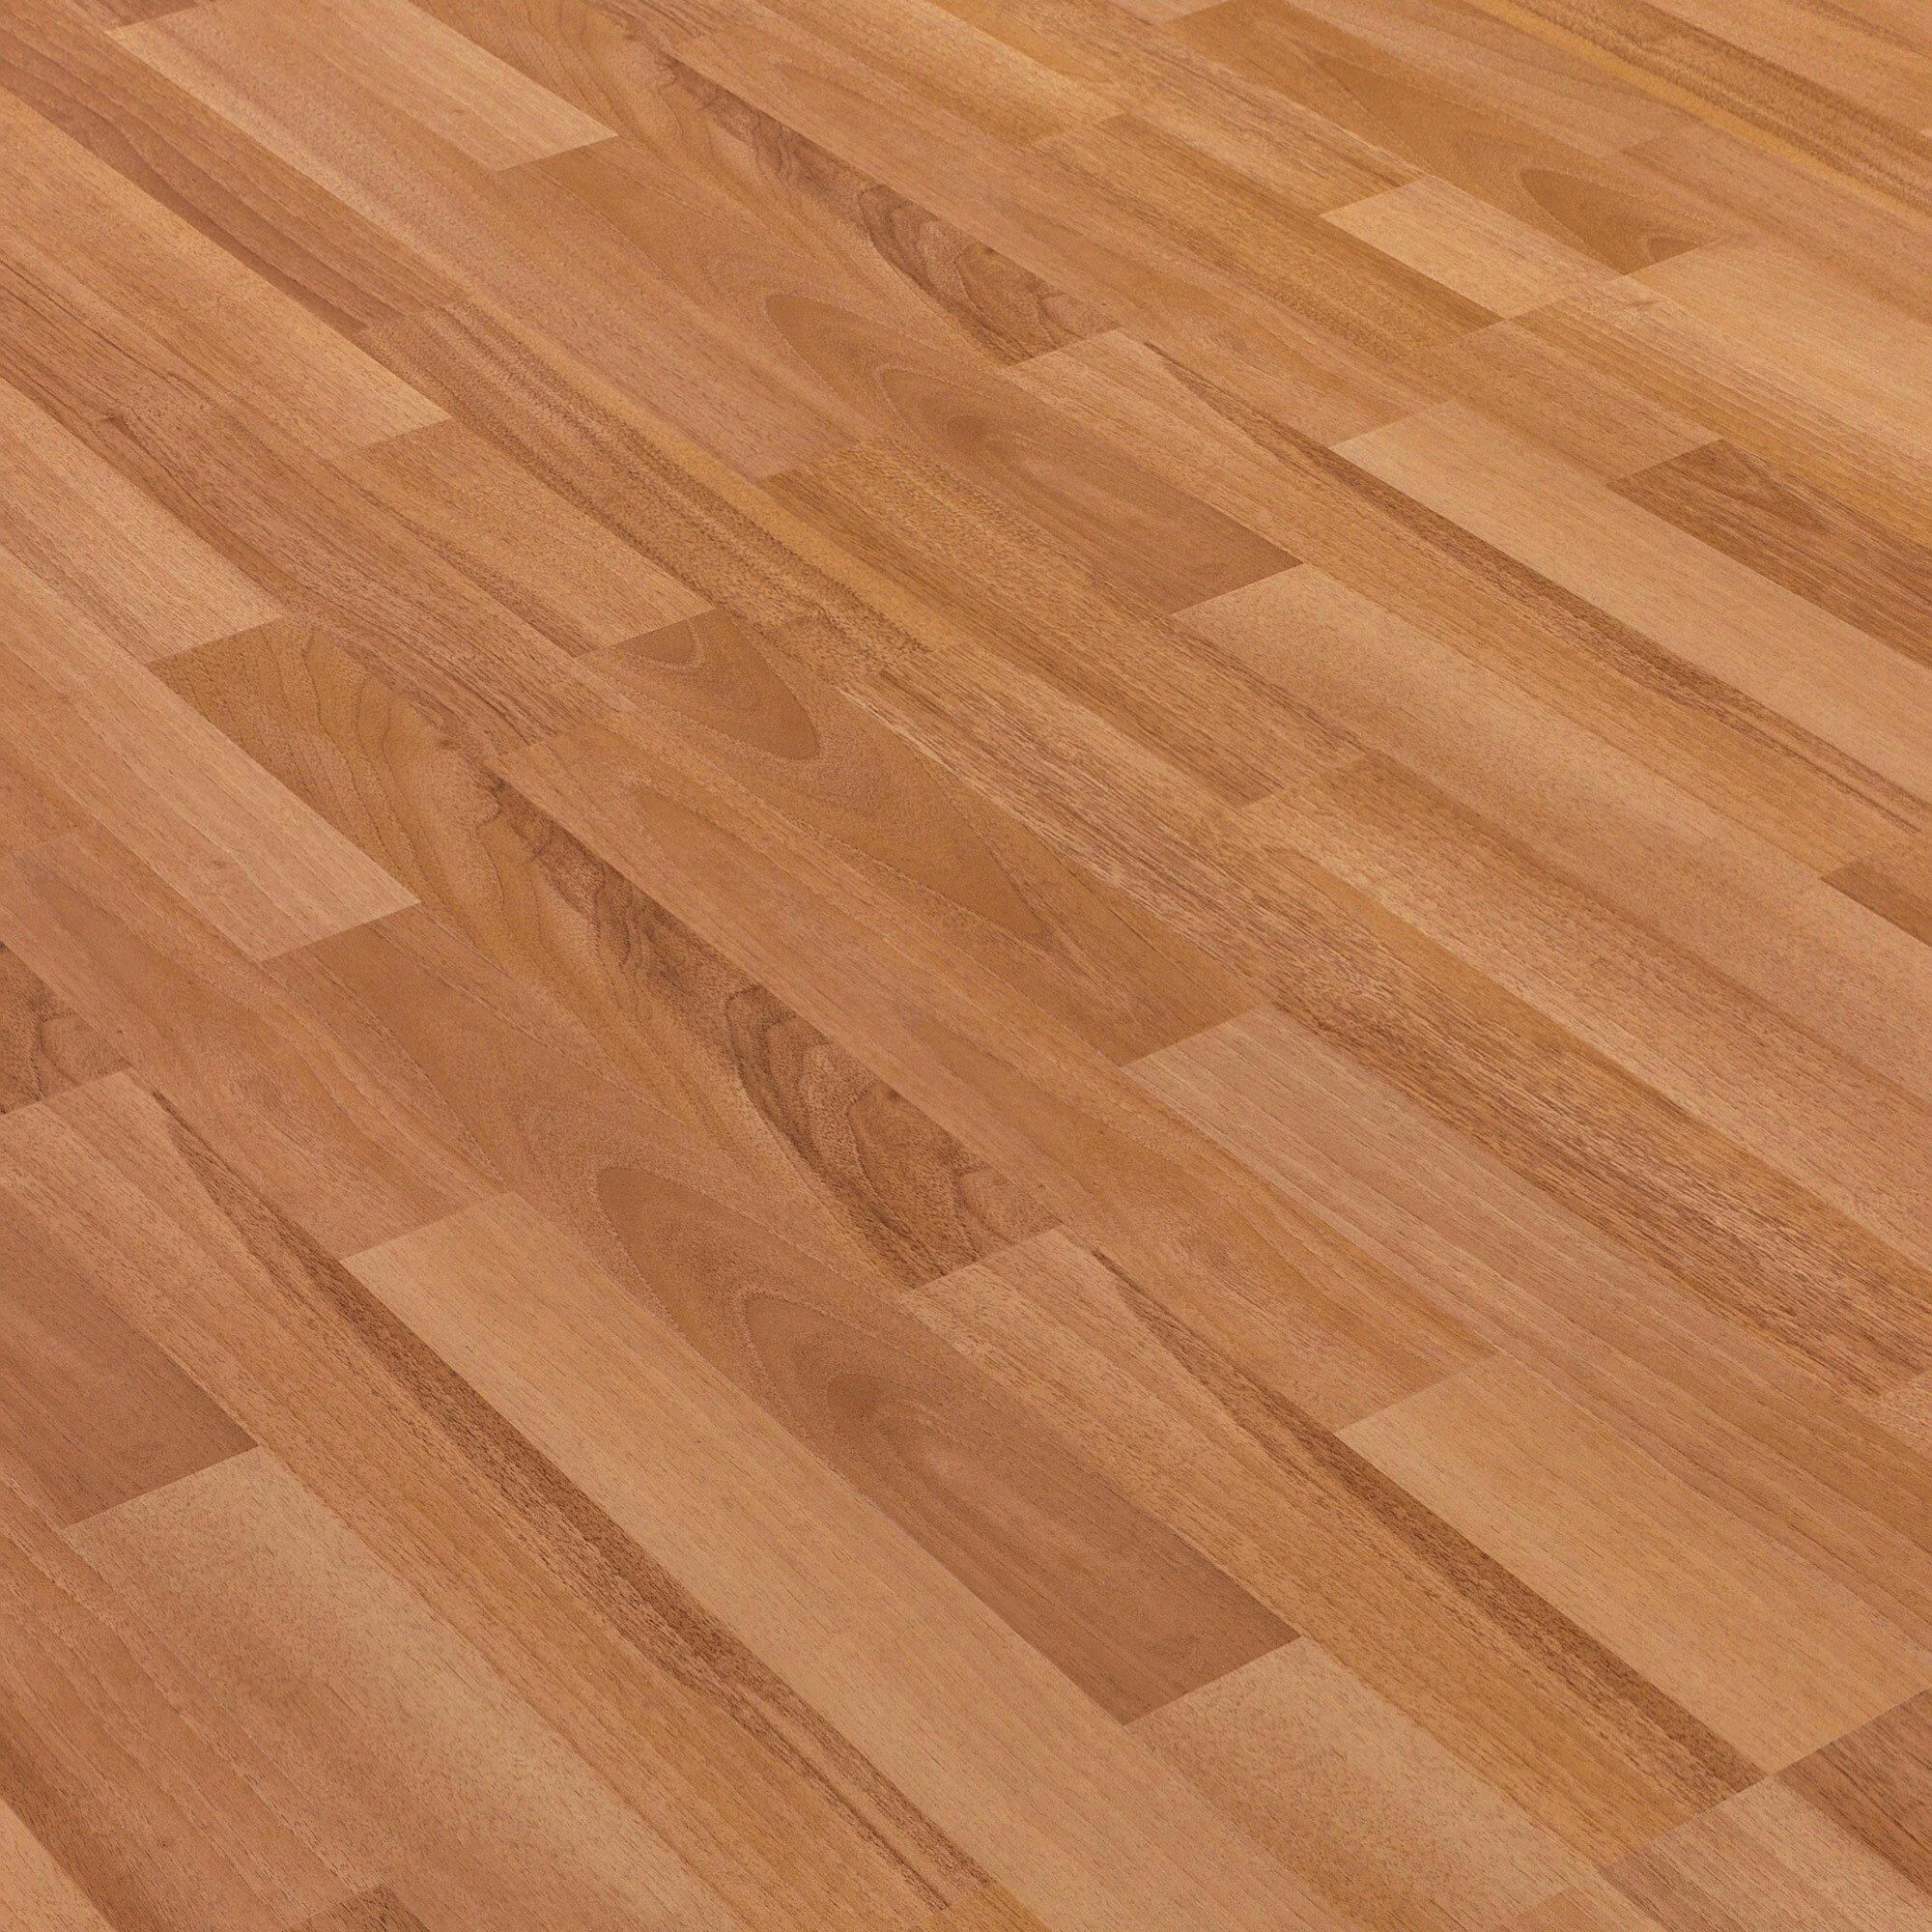 Kronoswiss 9 X 55 7mm Pine Laminate Flooring